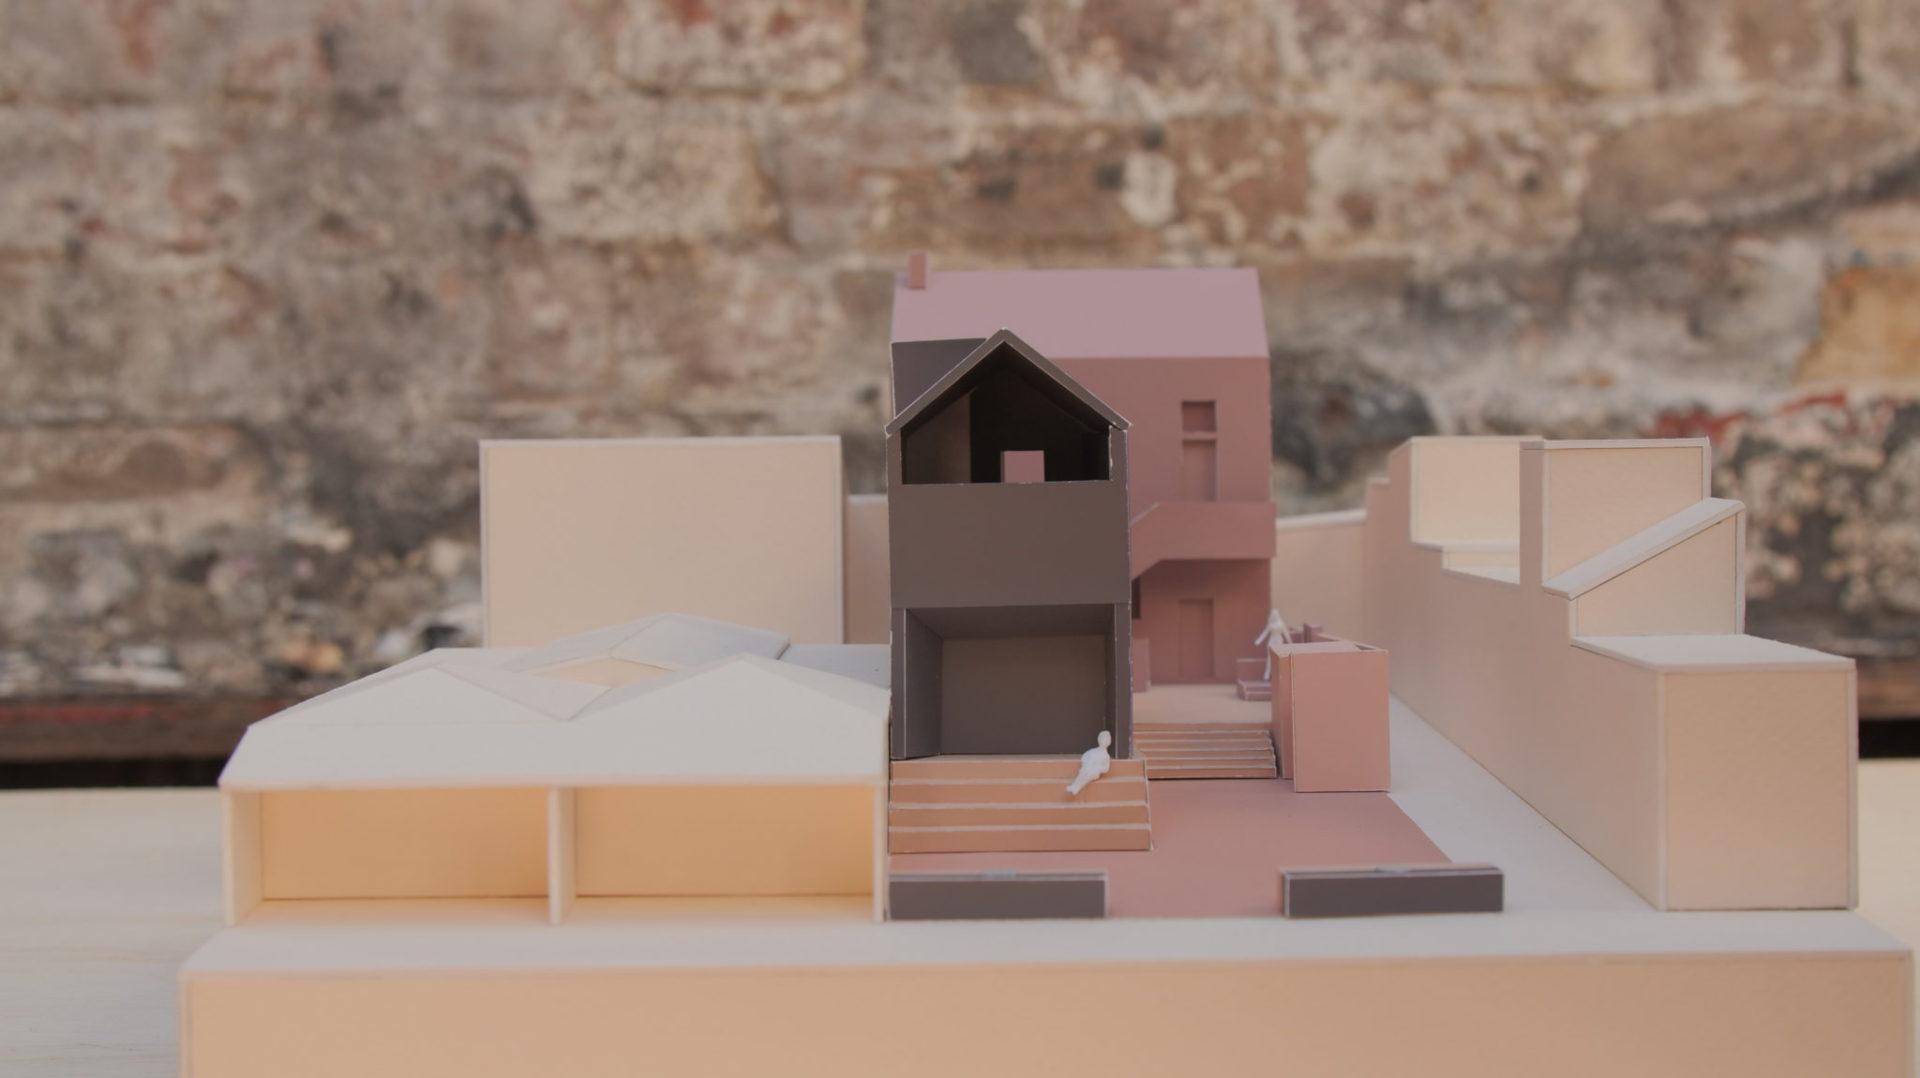 theatre design model front view